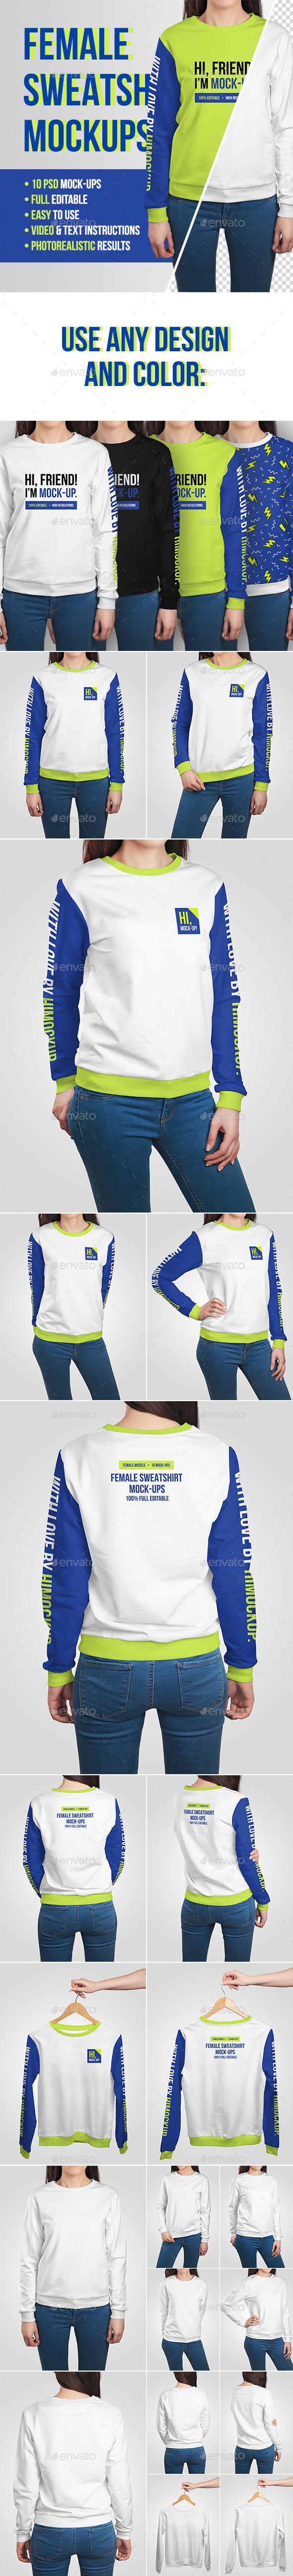 Female Sweatshirt Mockups - Apparel Product Mock-Ups